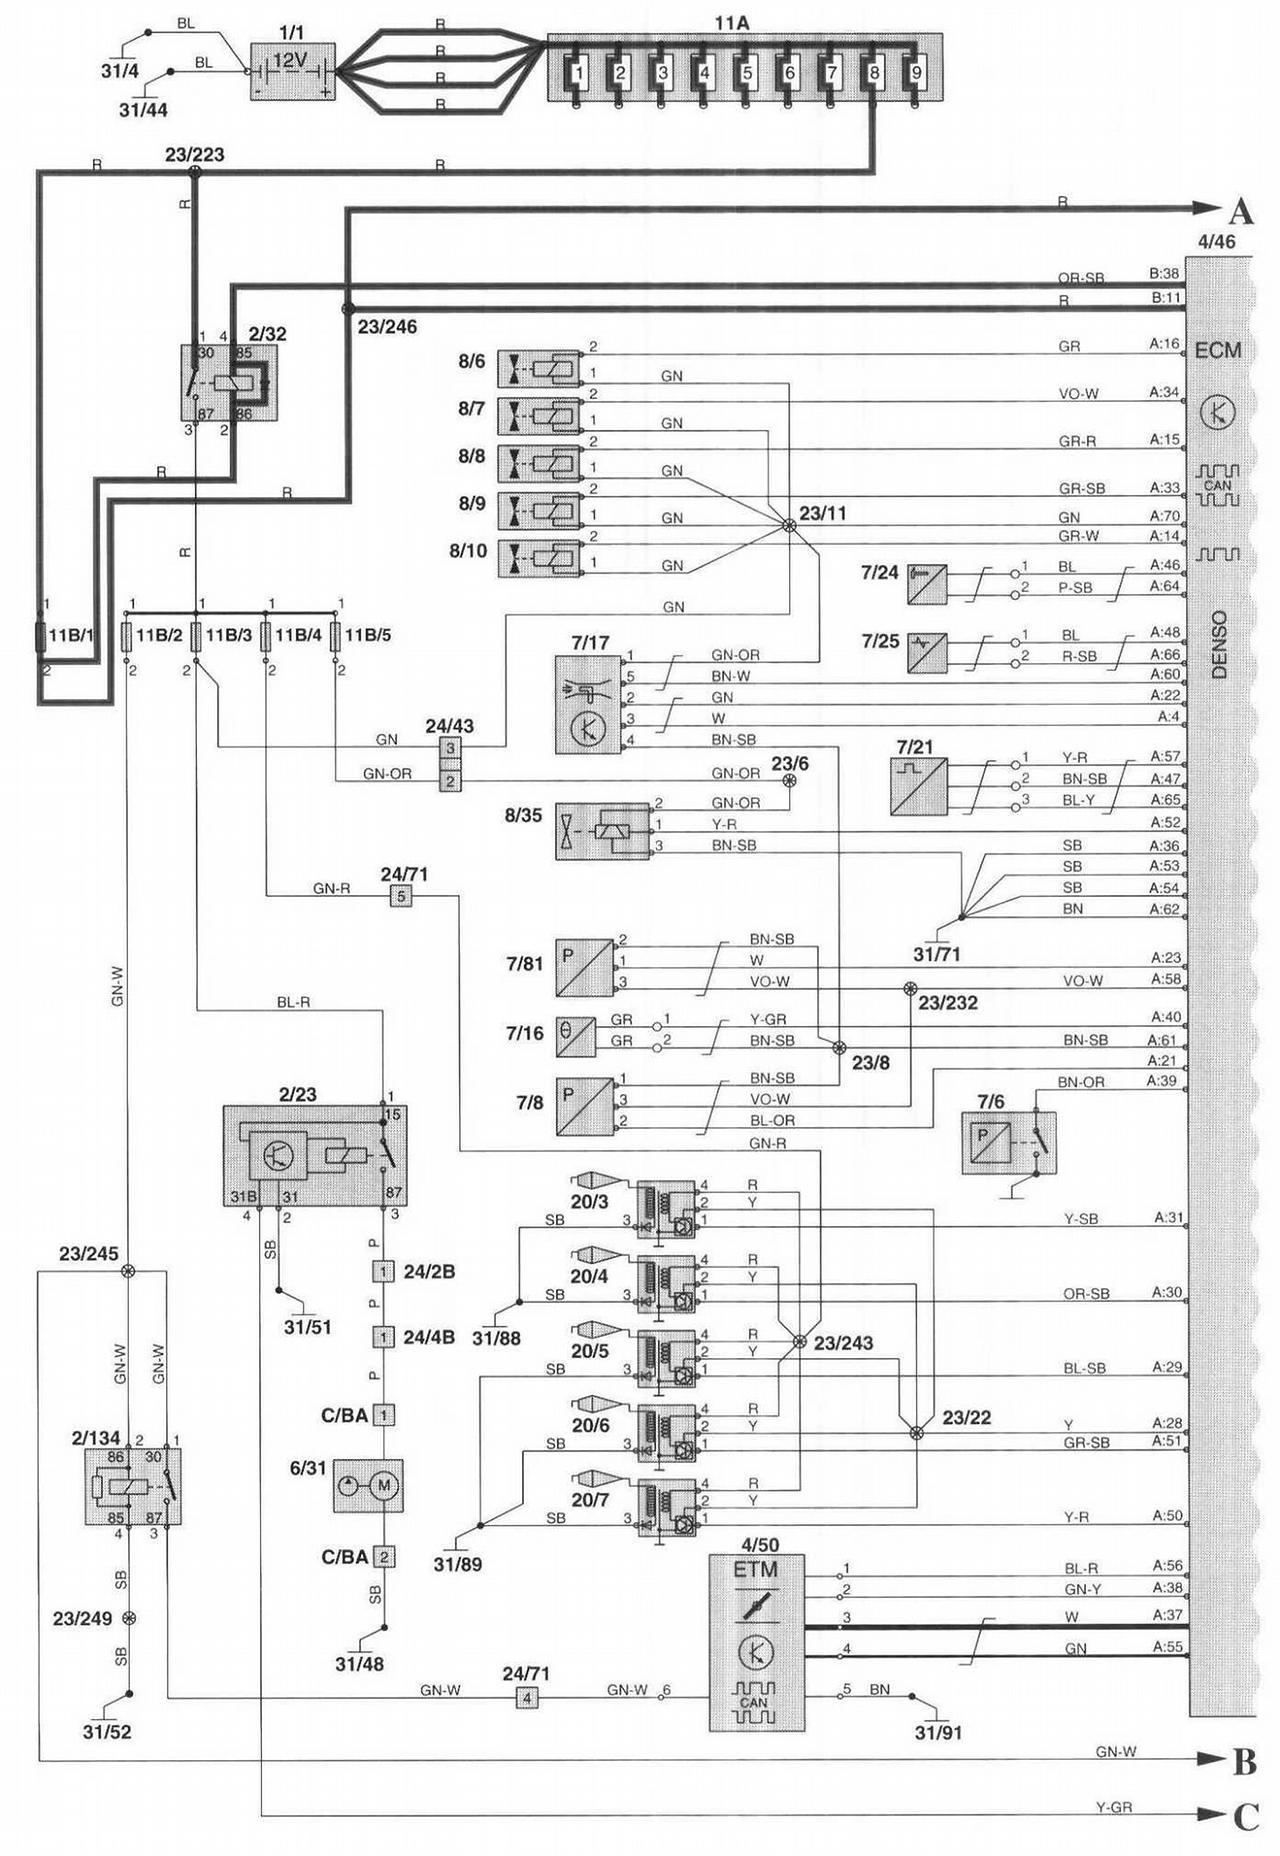 Extraordinary volvo ecr58 wiring diagram joy sticks ideas best cool volvo p1800s wiring diagram gallery electrical circuit greentooth Choice Image